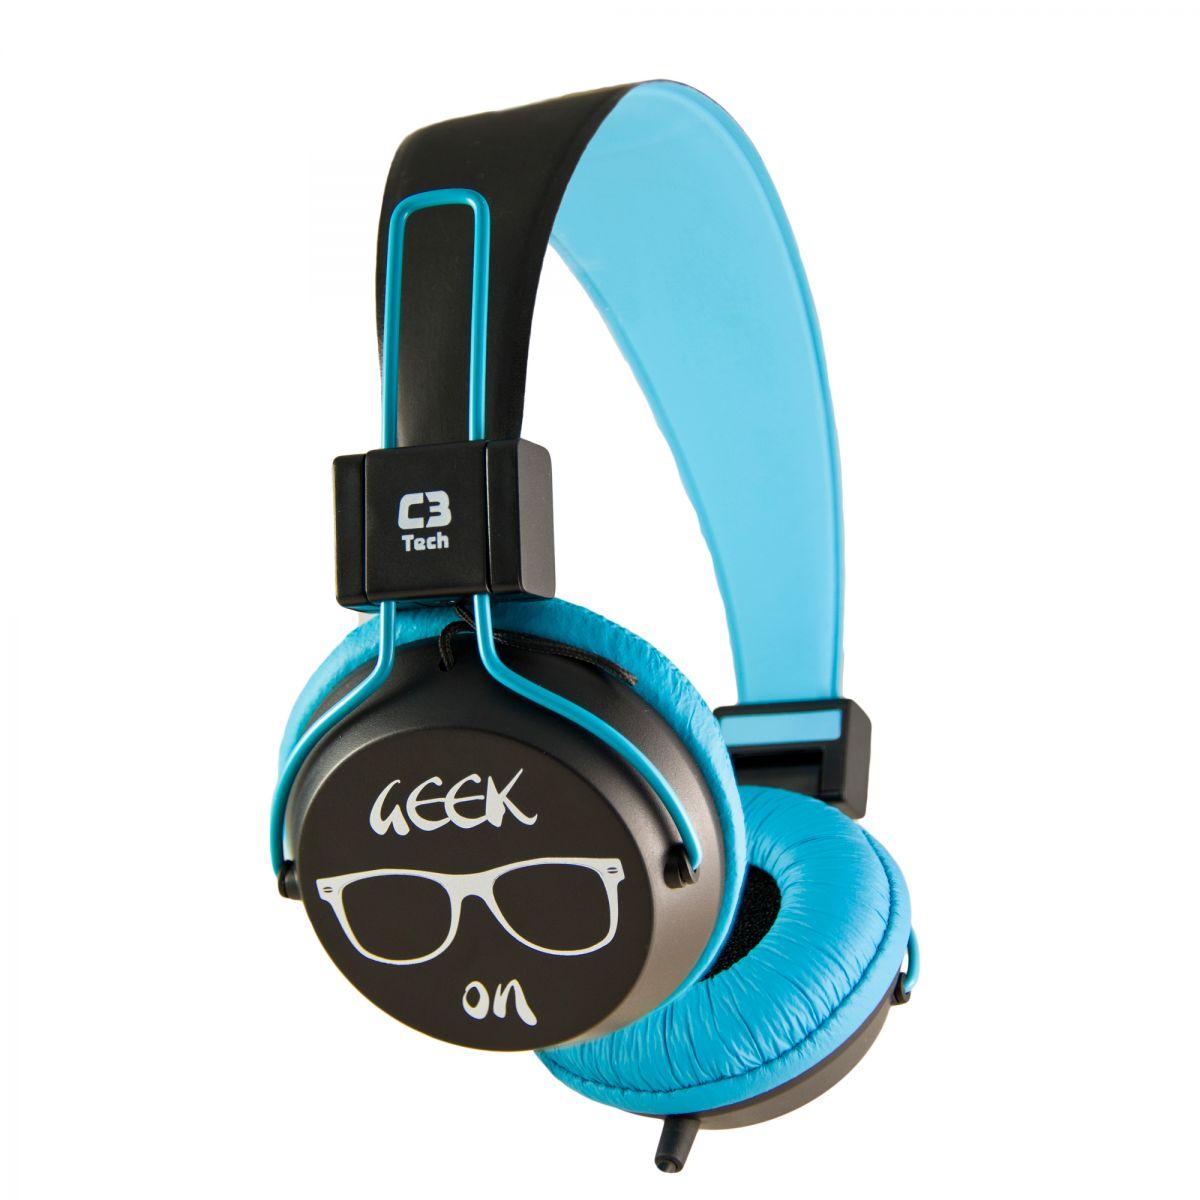 Fone de Ouvido Headset Multimídia Preto/Azul C3 Tech - MI-2358RL  - ShopNoroeste.com.br